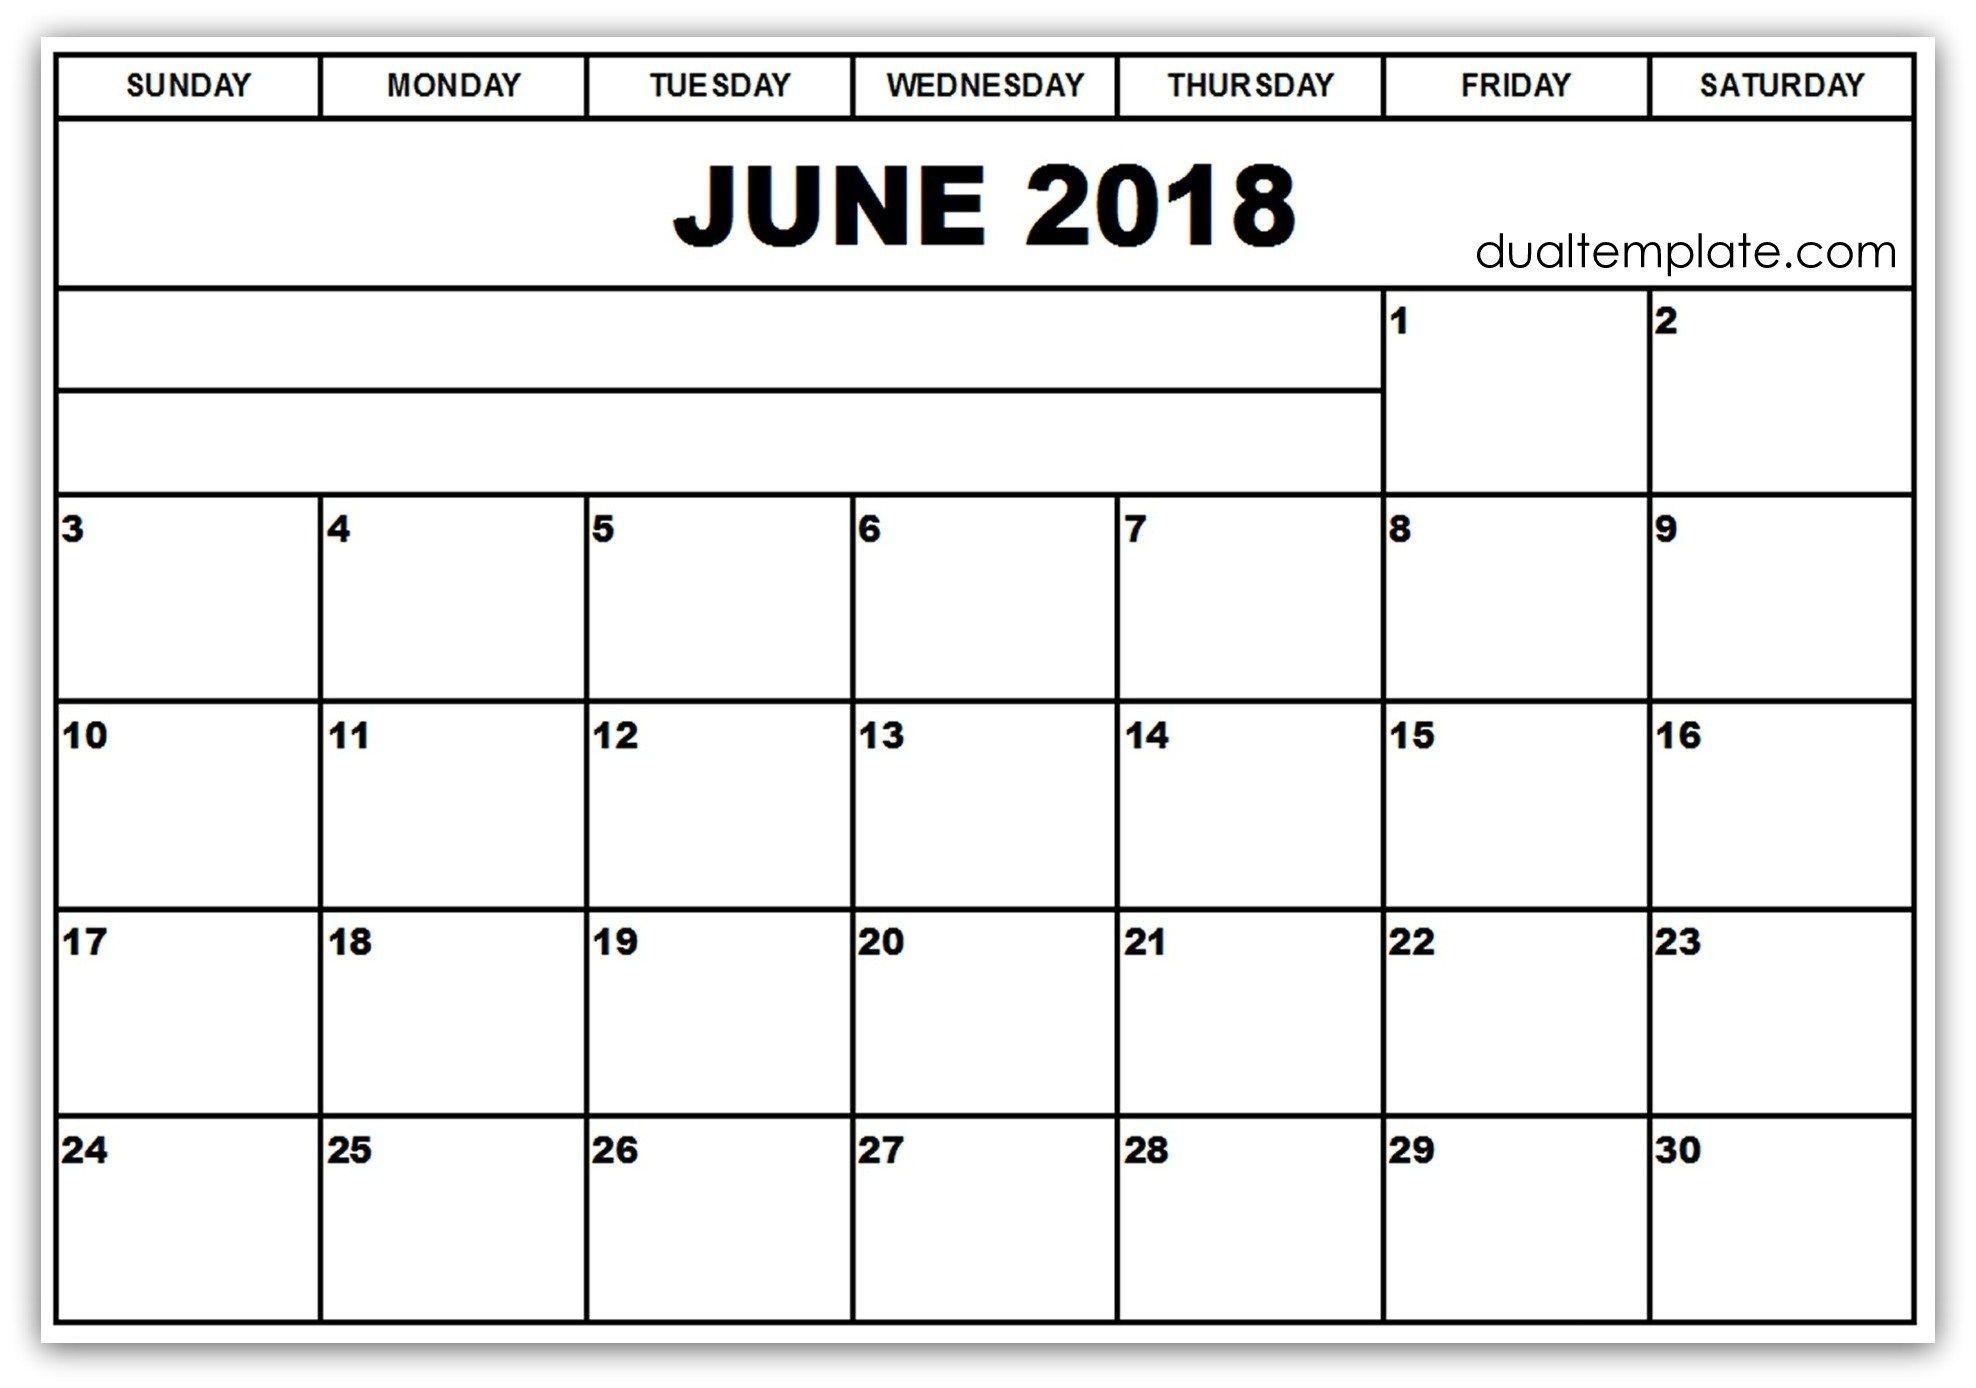 Free Printable Weekly Calendar 2019 Julian Date Calendar with 2018 Julian Calendar